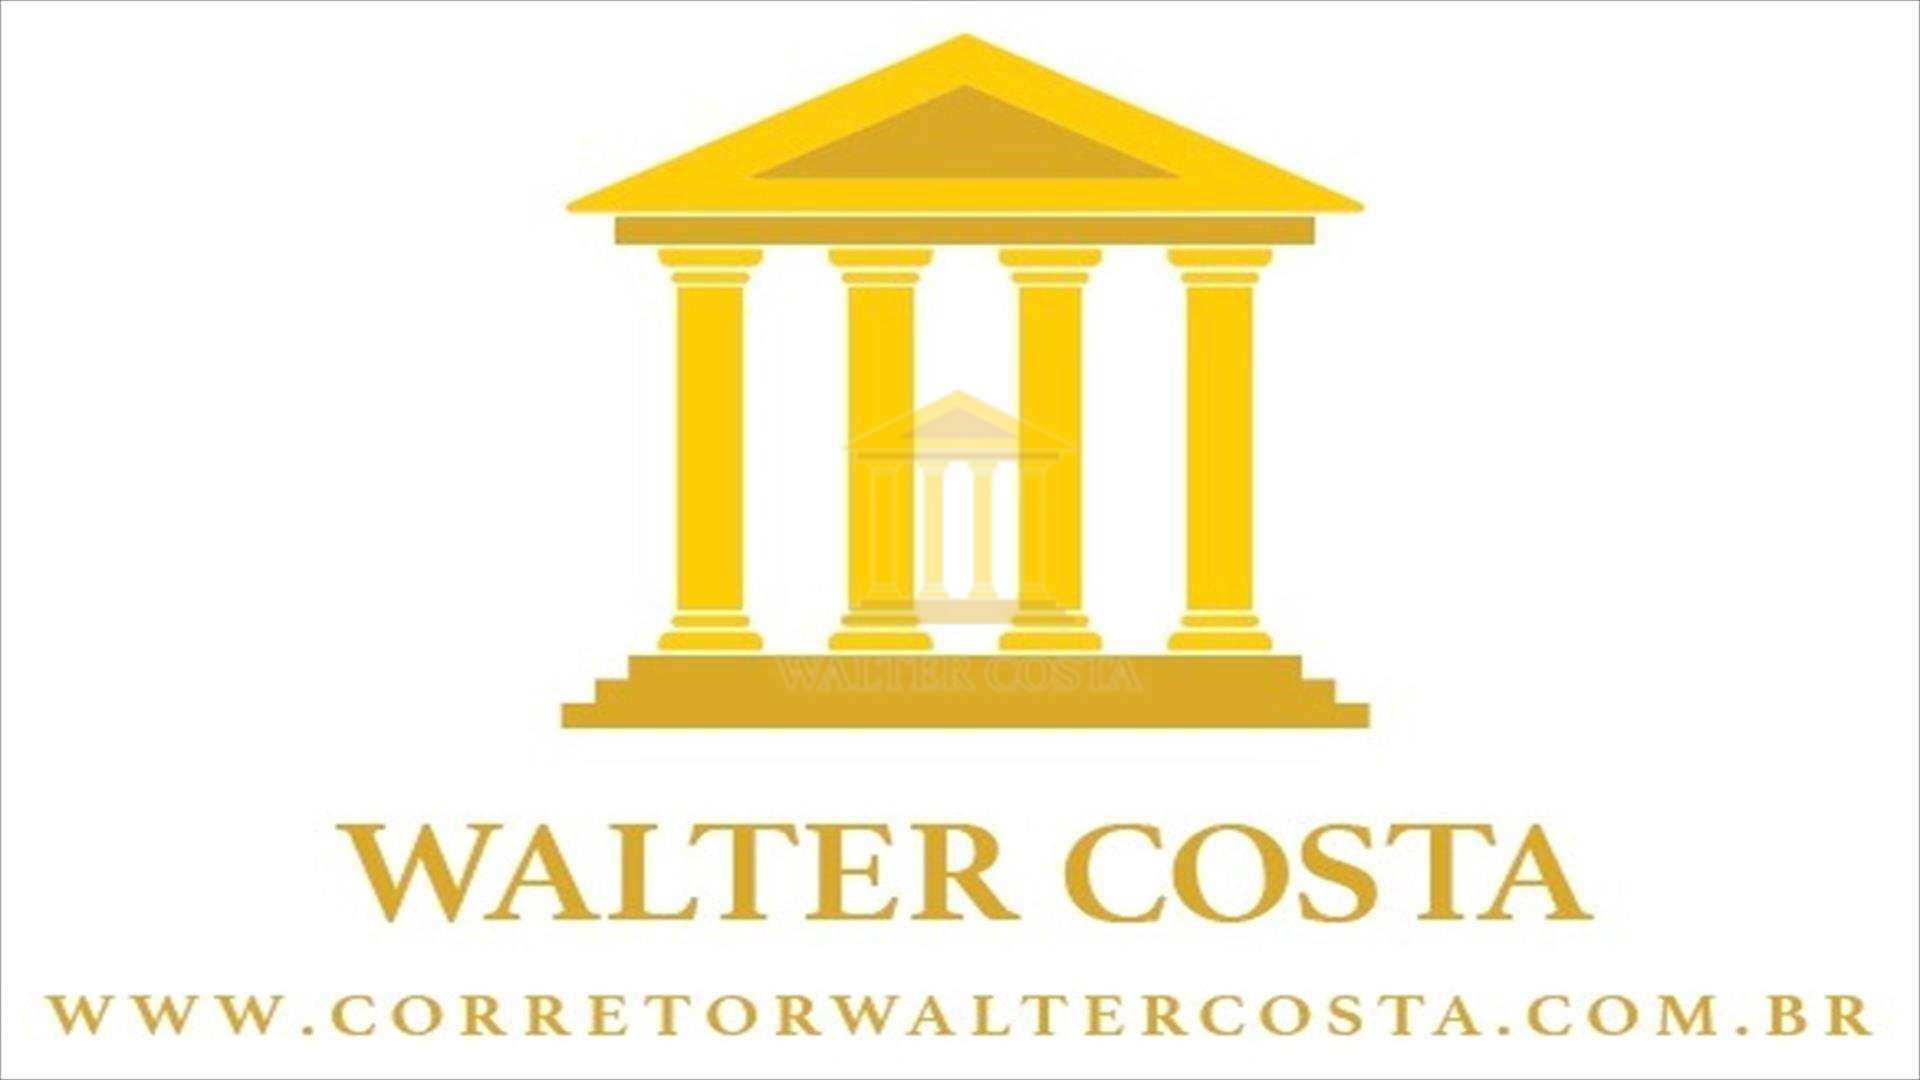 20100-LOGO_CORRETOR_WALTER_COSTA_NOVO.jpg